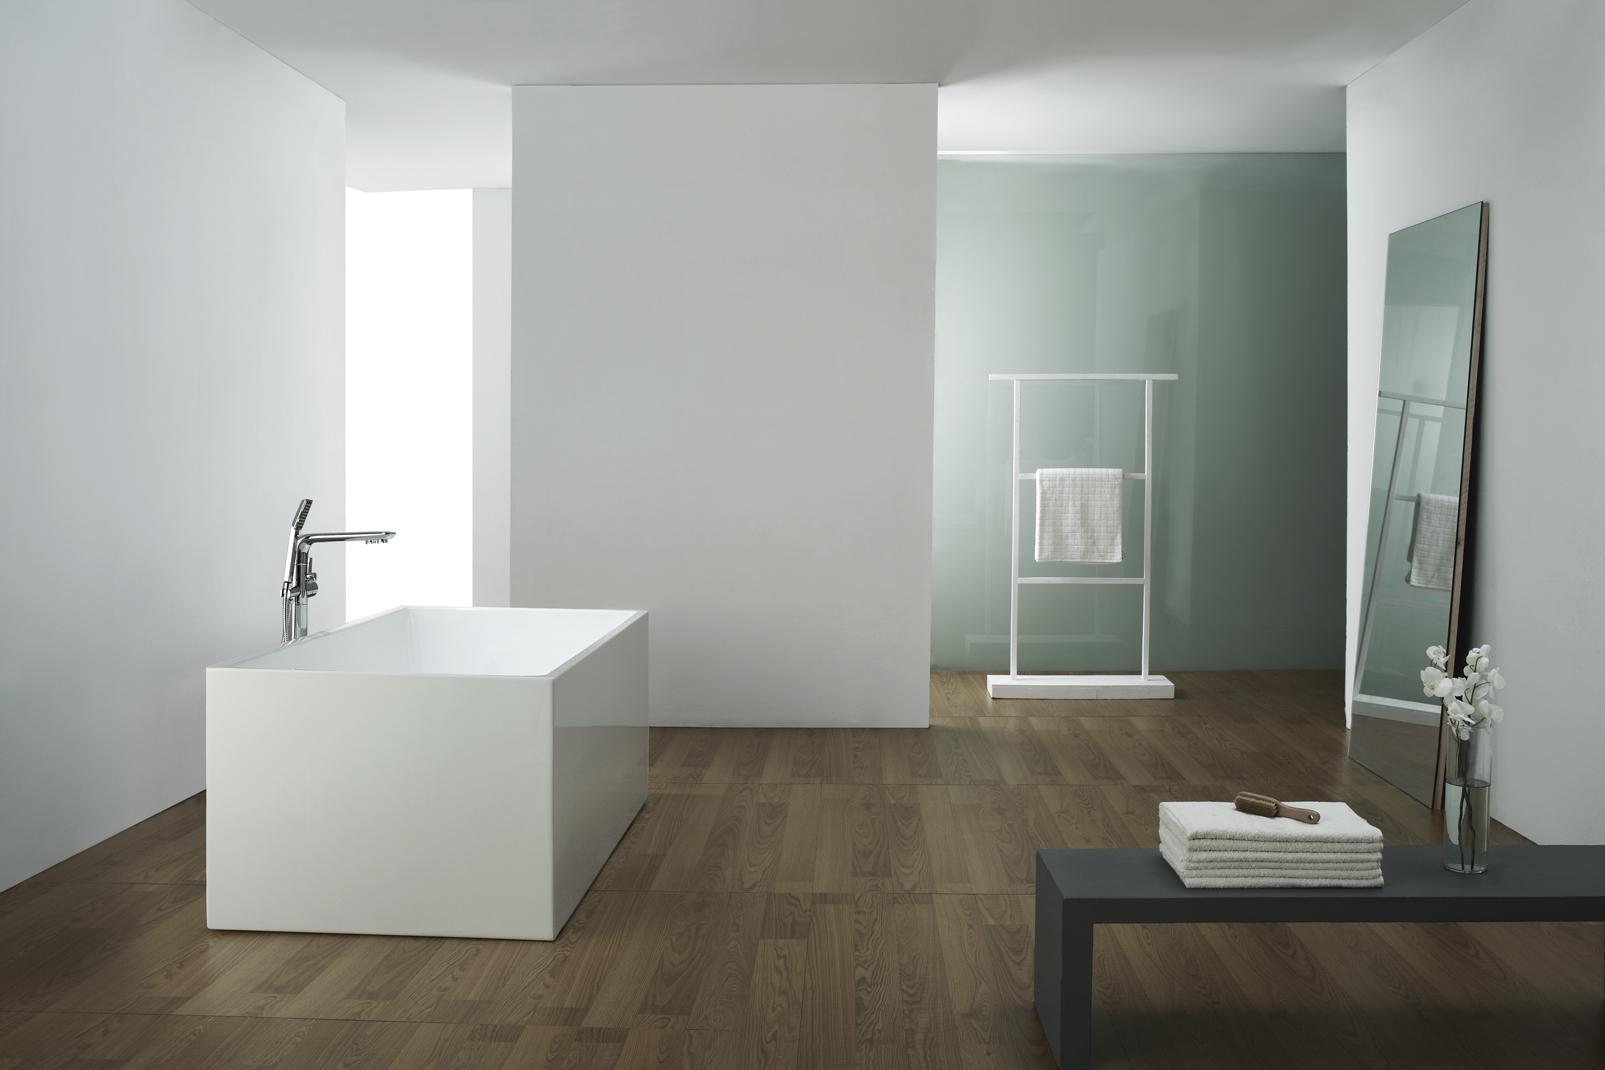 Vasca Da Bagno 160 80 : Vasche da bagno freestanding casafacile